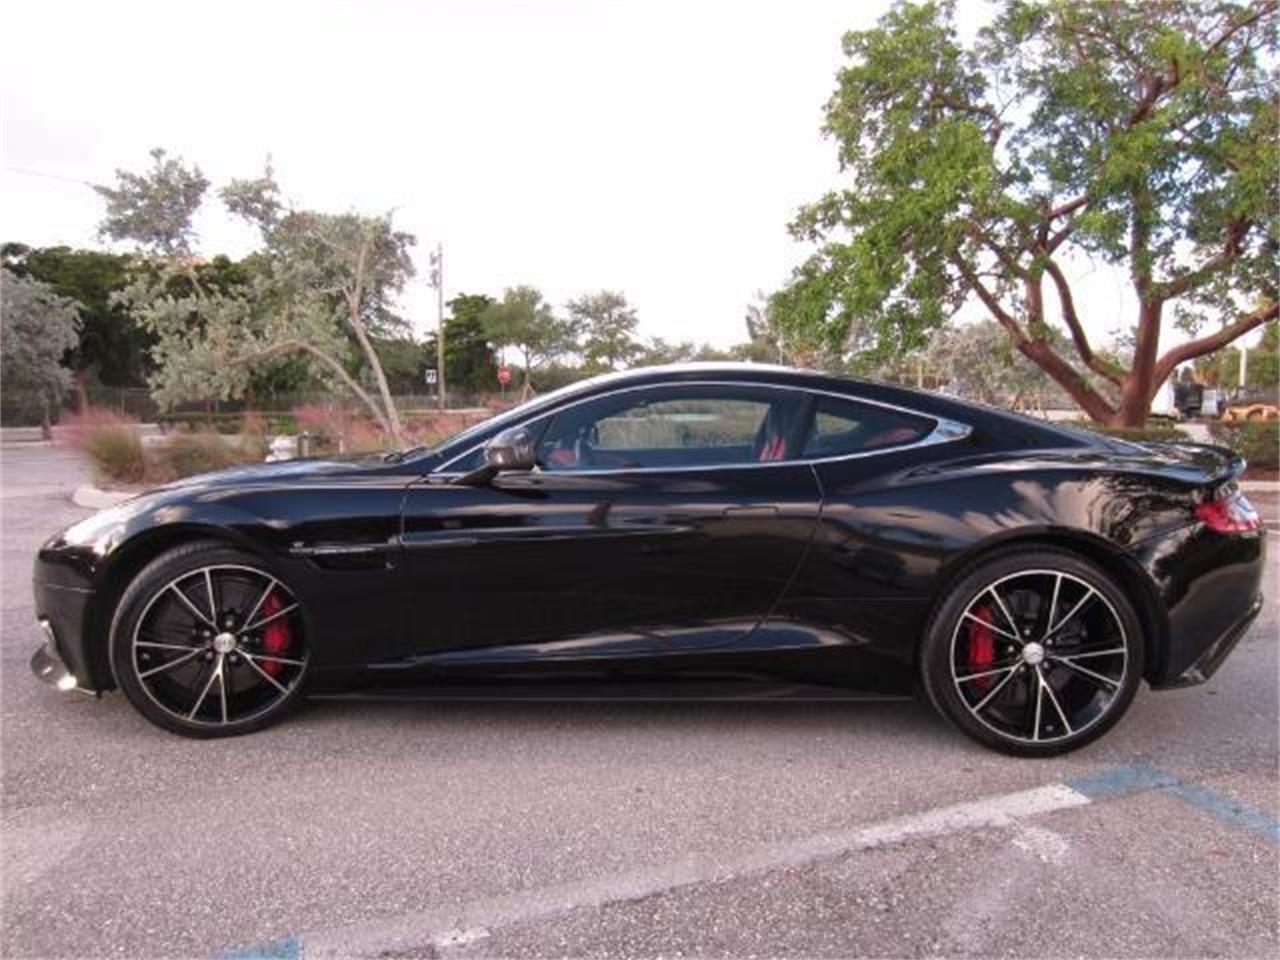 2014 Aston Martin Vanquish for Sale | ClassicCars.com | CC-1039166